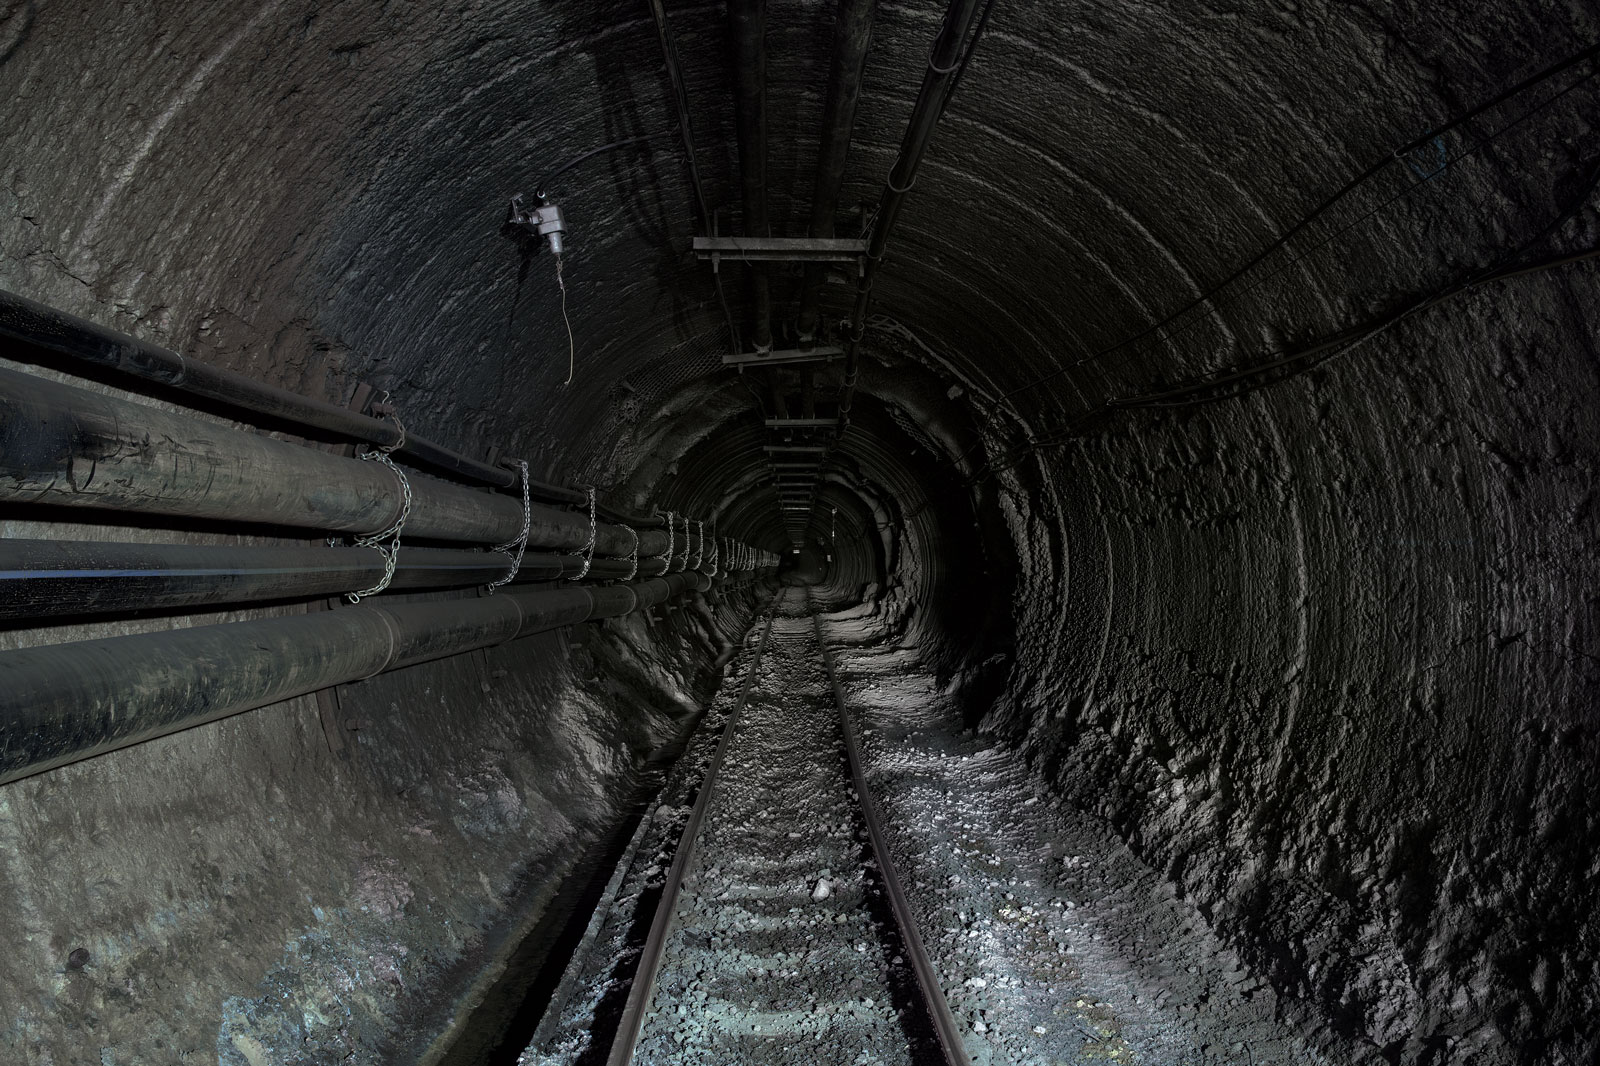 mine shaft wallpaper - photo #10